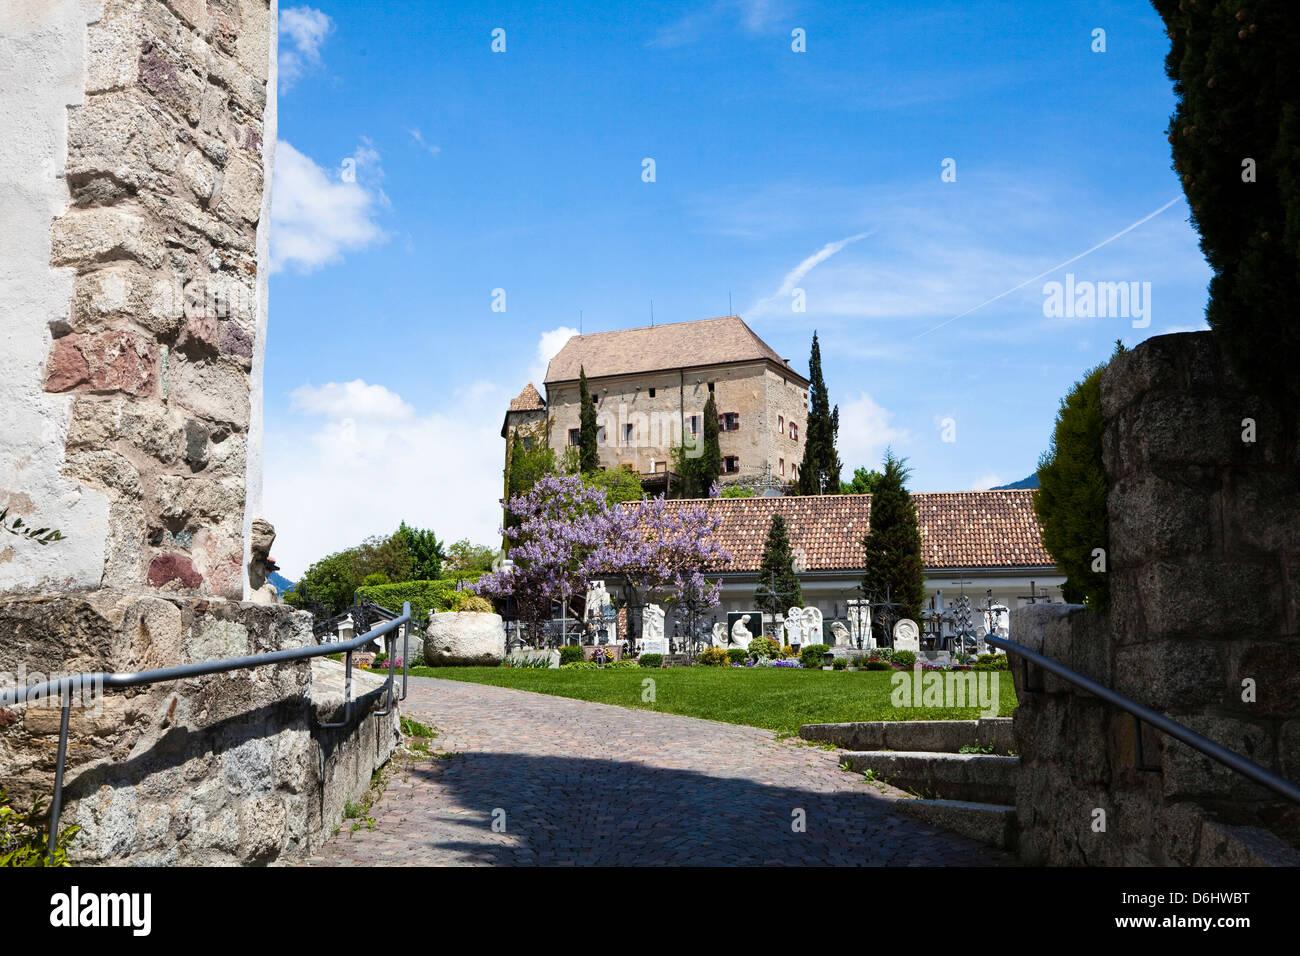 Eastern Alps, South Tyrol, Italy. Schenna (Scena) near Meran (Merano) with church Maria Aufnahme, and castle. Stock Photo